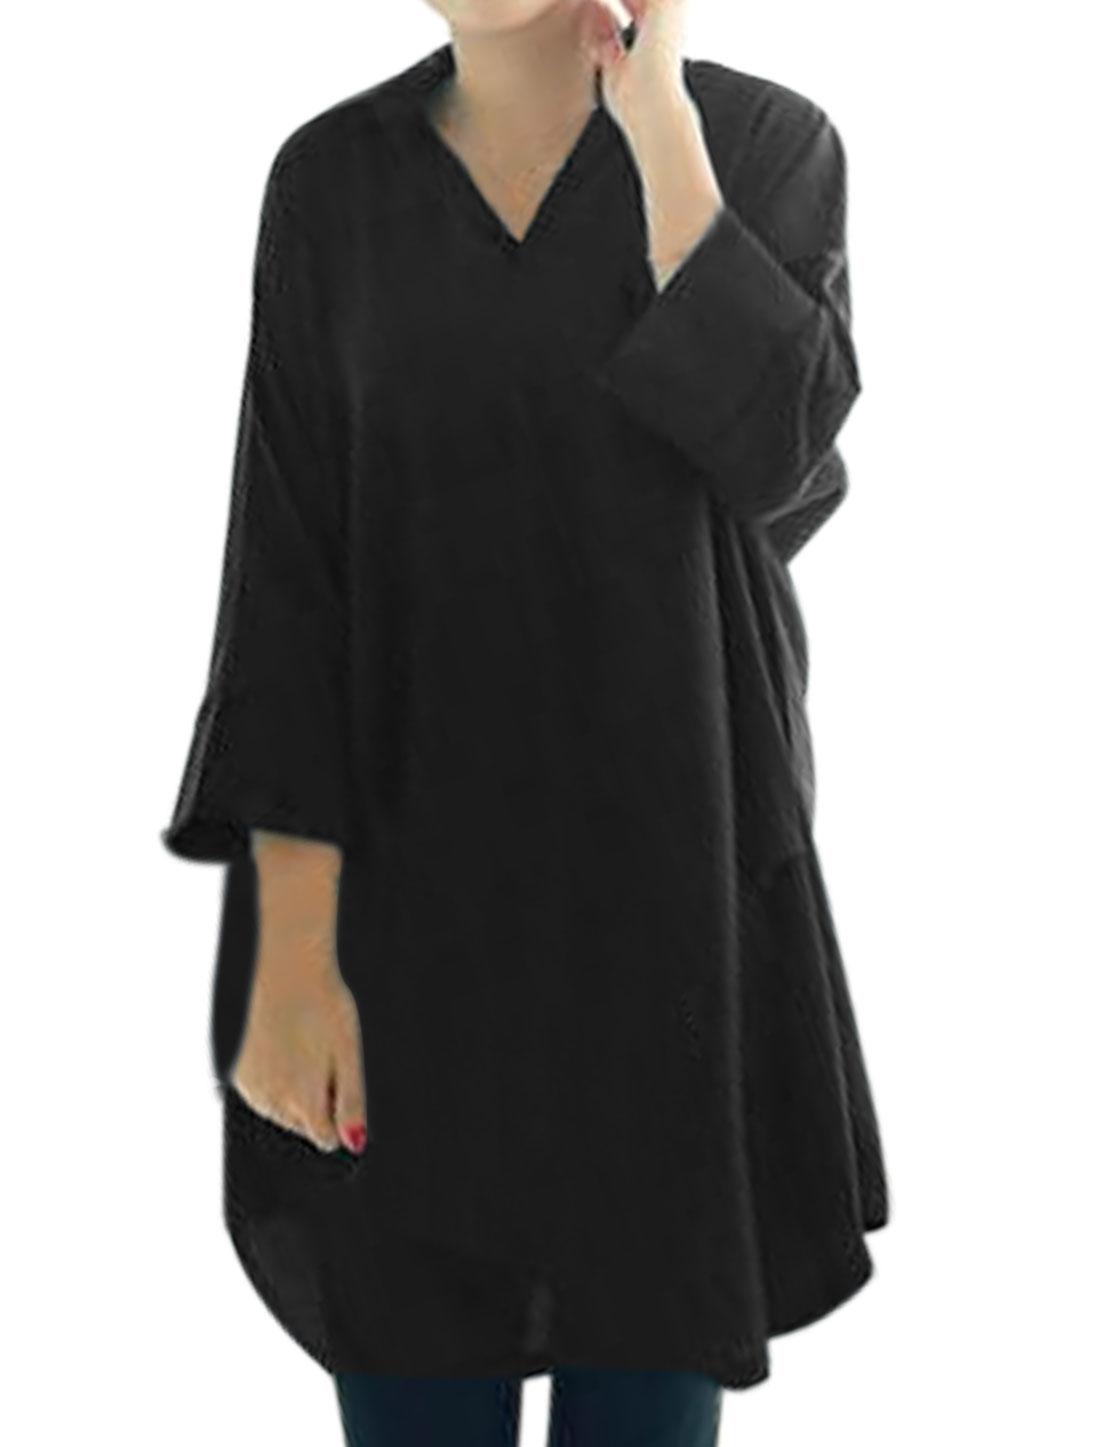 Women Turn Down Collar 3/4 Sleeves Loose Tunic Top Black S